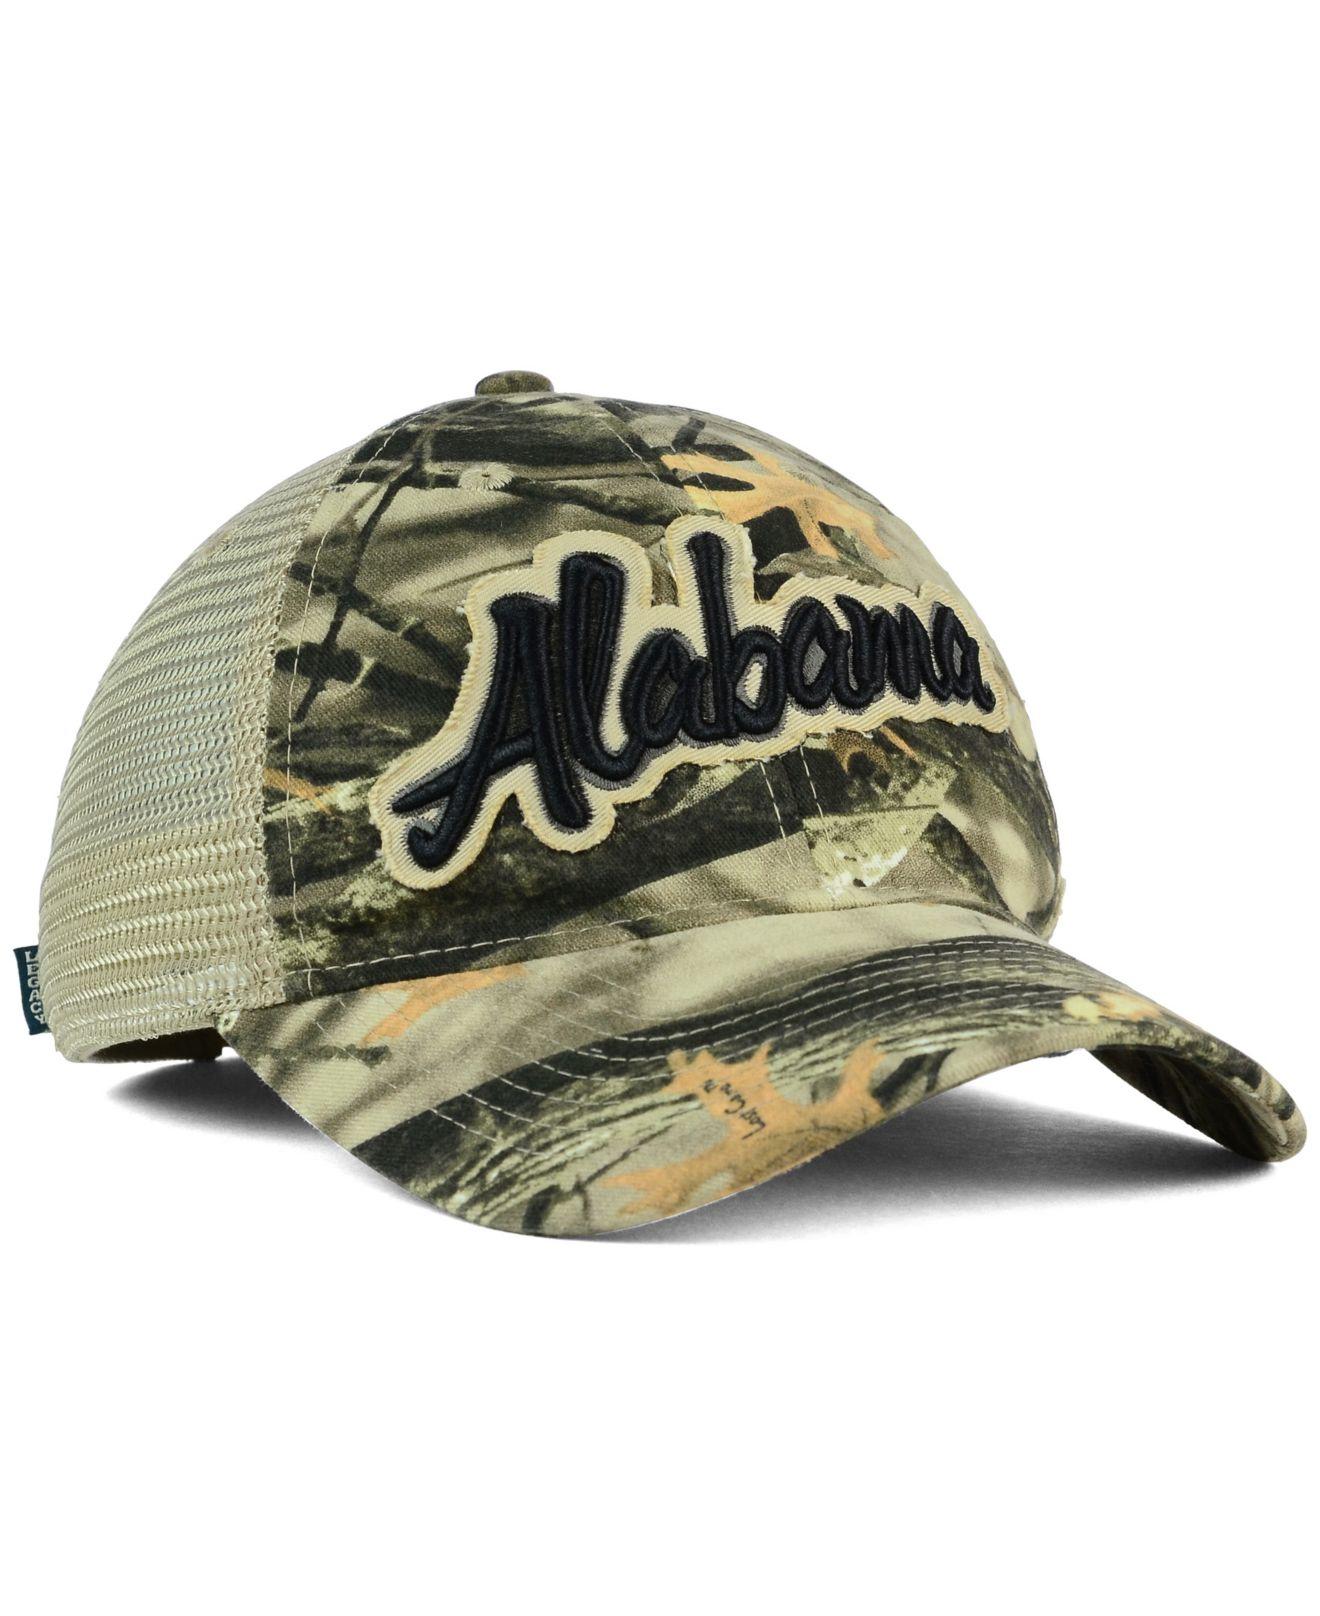 reduced legacy alabama hat 987ca bf277